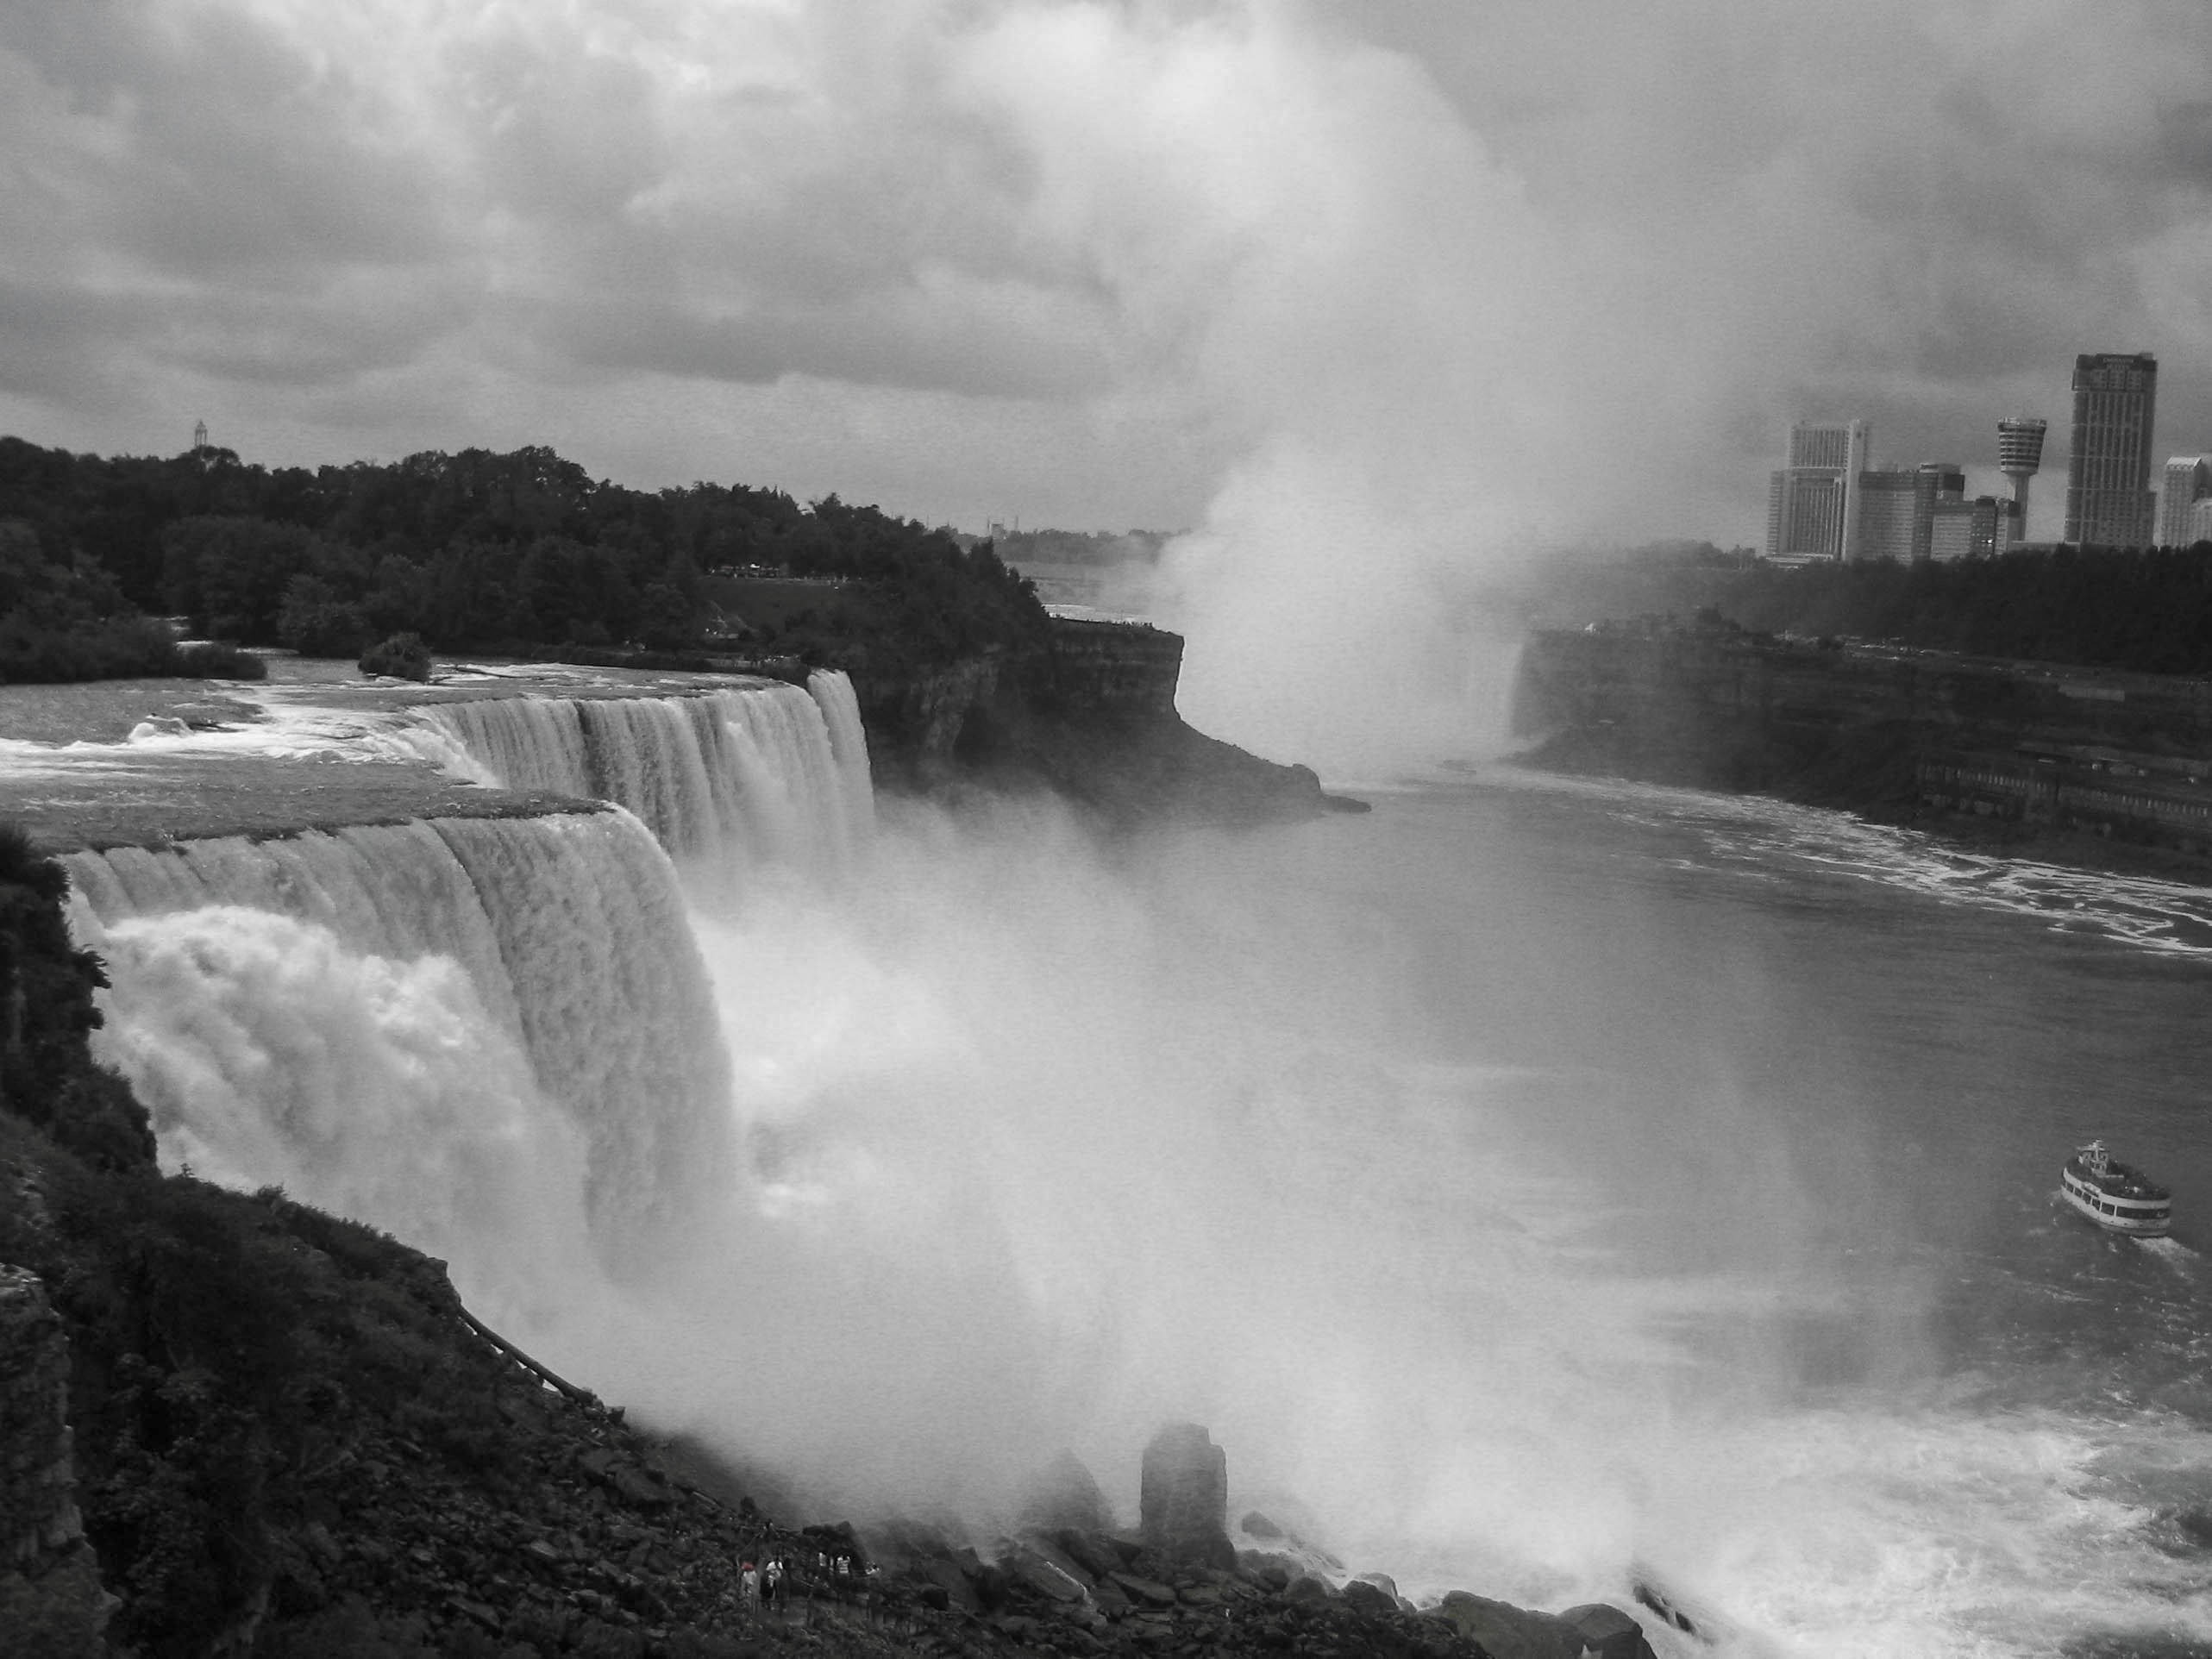 Ниагарские водопады, США - Канада